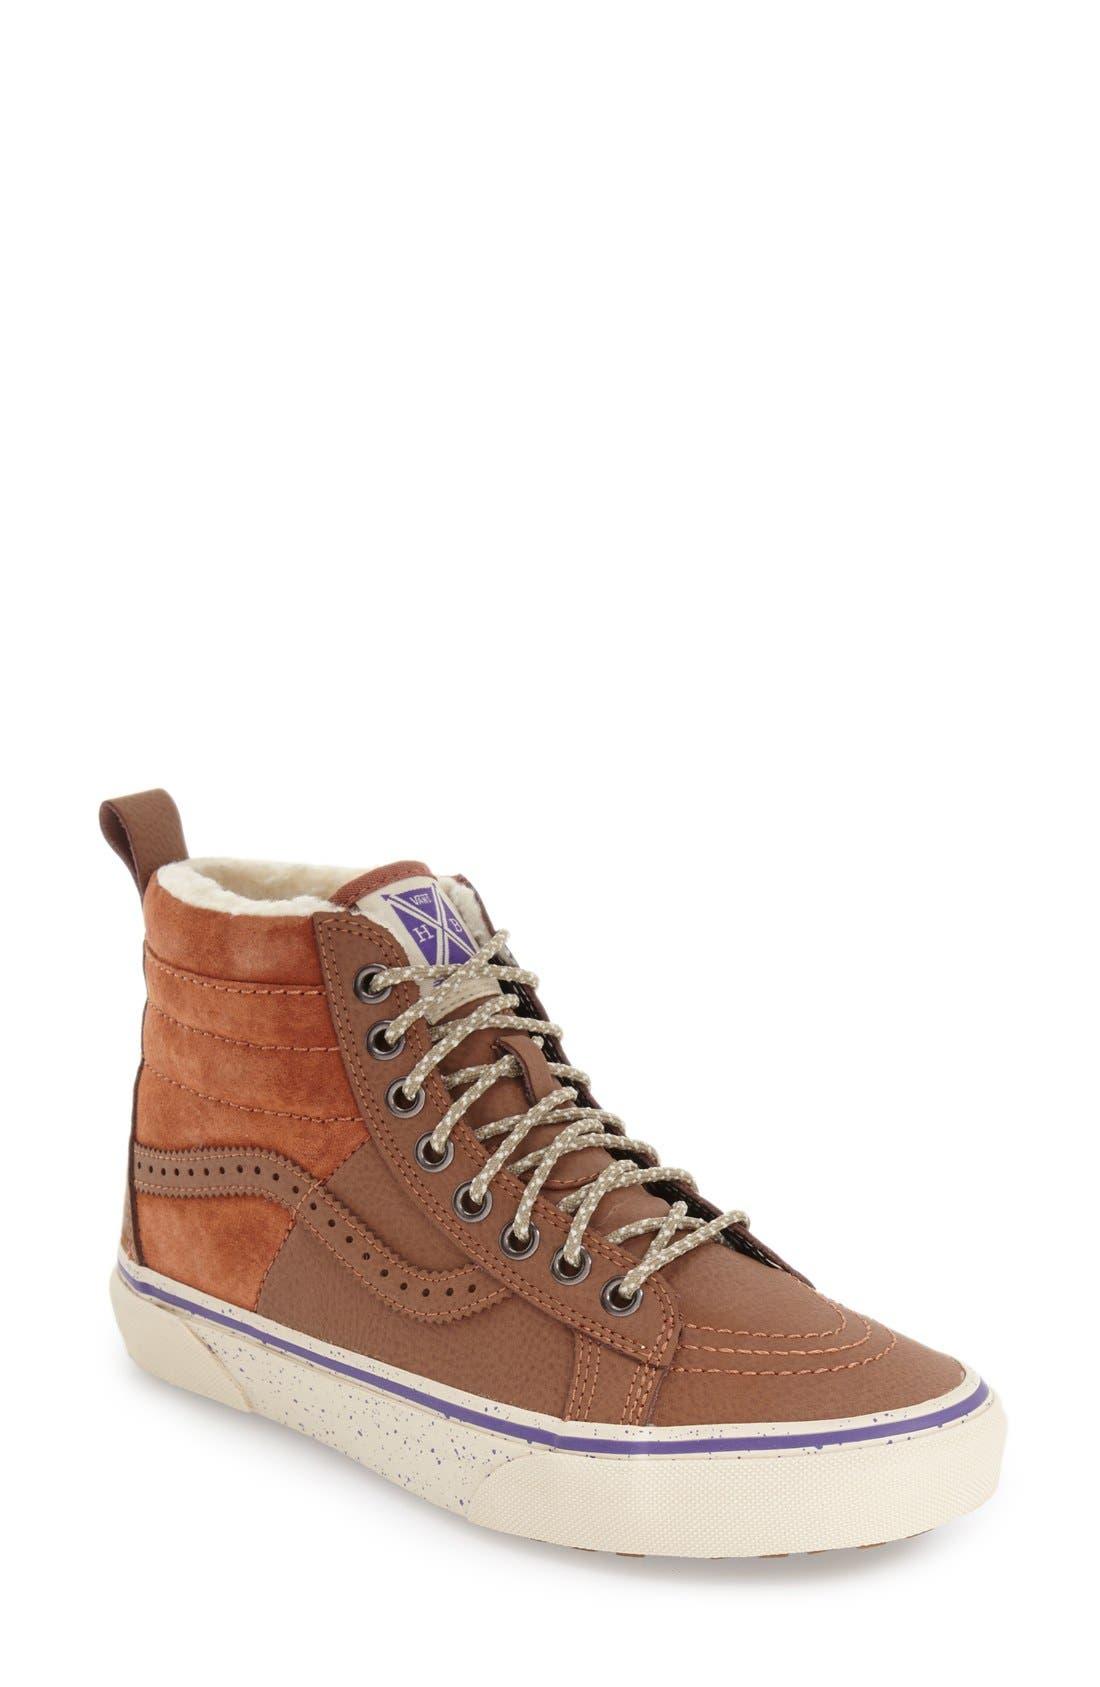 Alternate Image 1 Selected - Vans Hana Beaman – SK8-Hi 46 MTE Water Resistant Sneaker (Women)